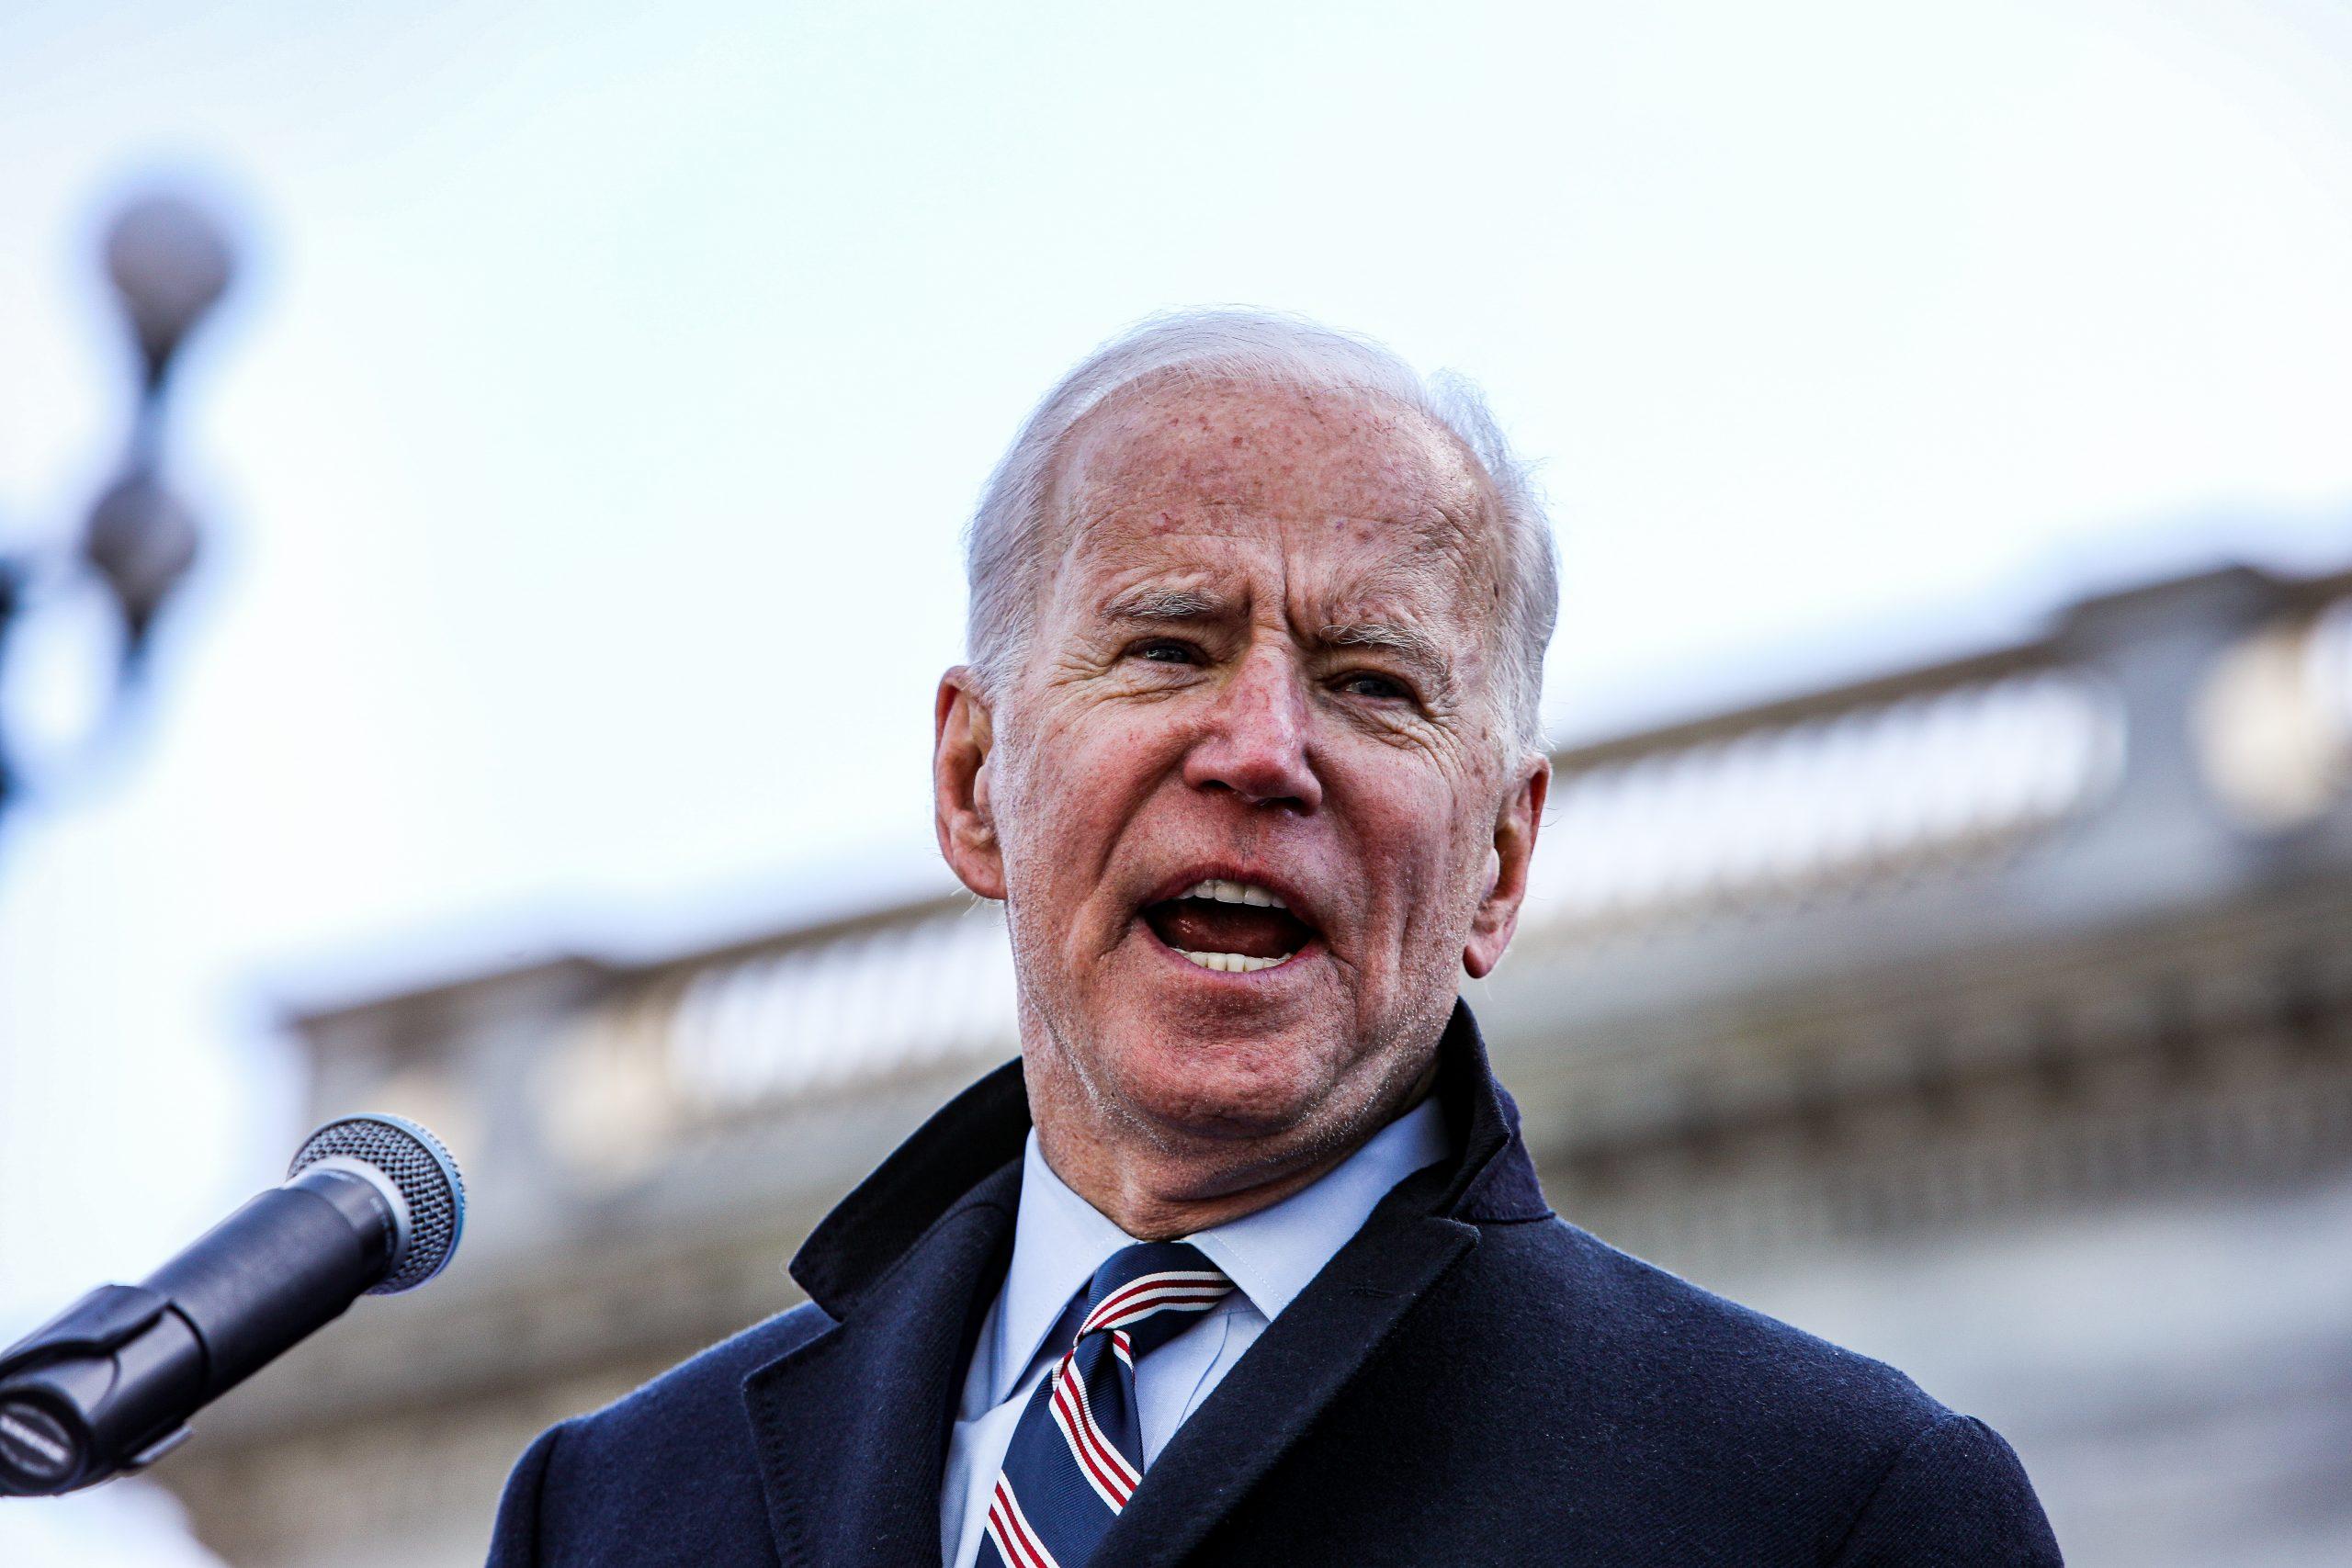 MUST WATCH: NYSFA's Digital Ad on Biden's Gun Control Agenda!